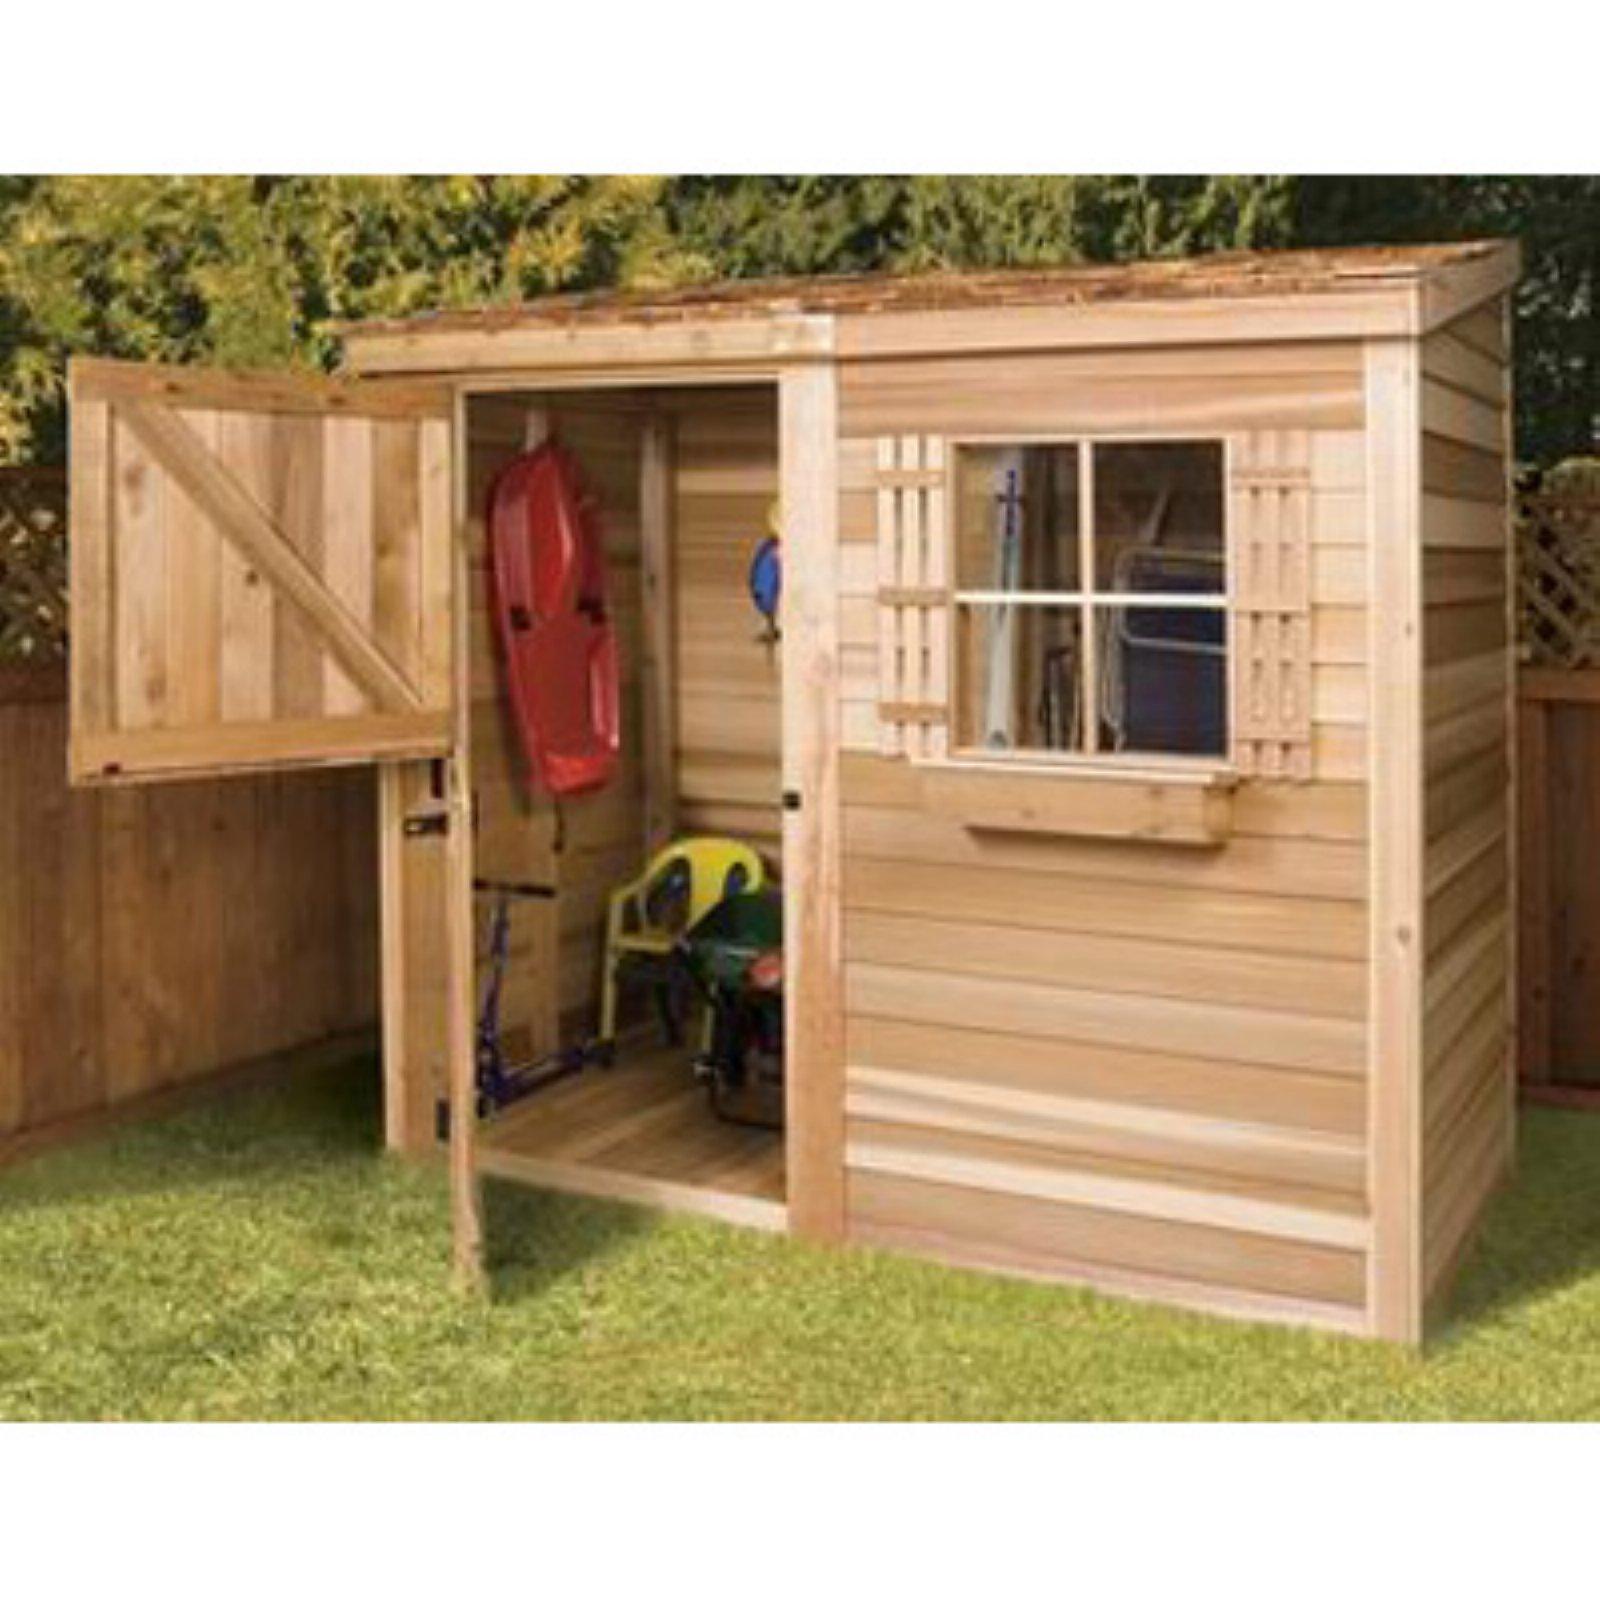 Cedar Shed 8 x 4 ft. Bayside Wood Storage Shed - Walmart.com